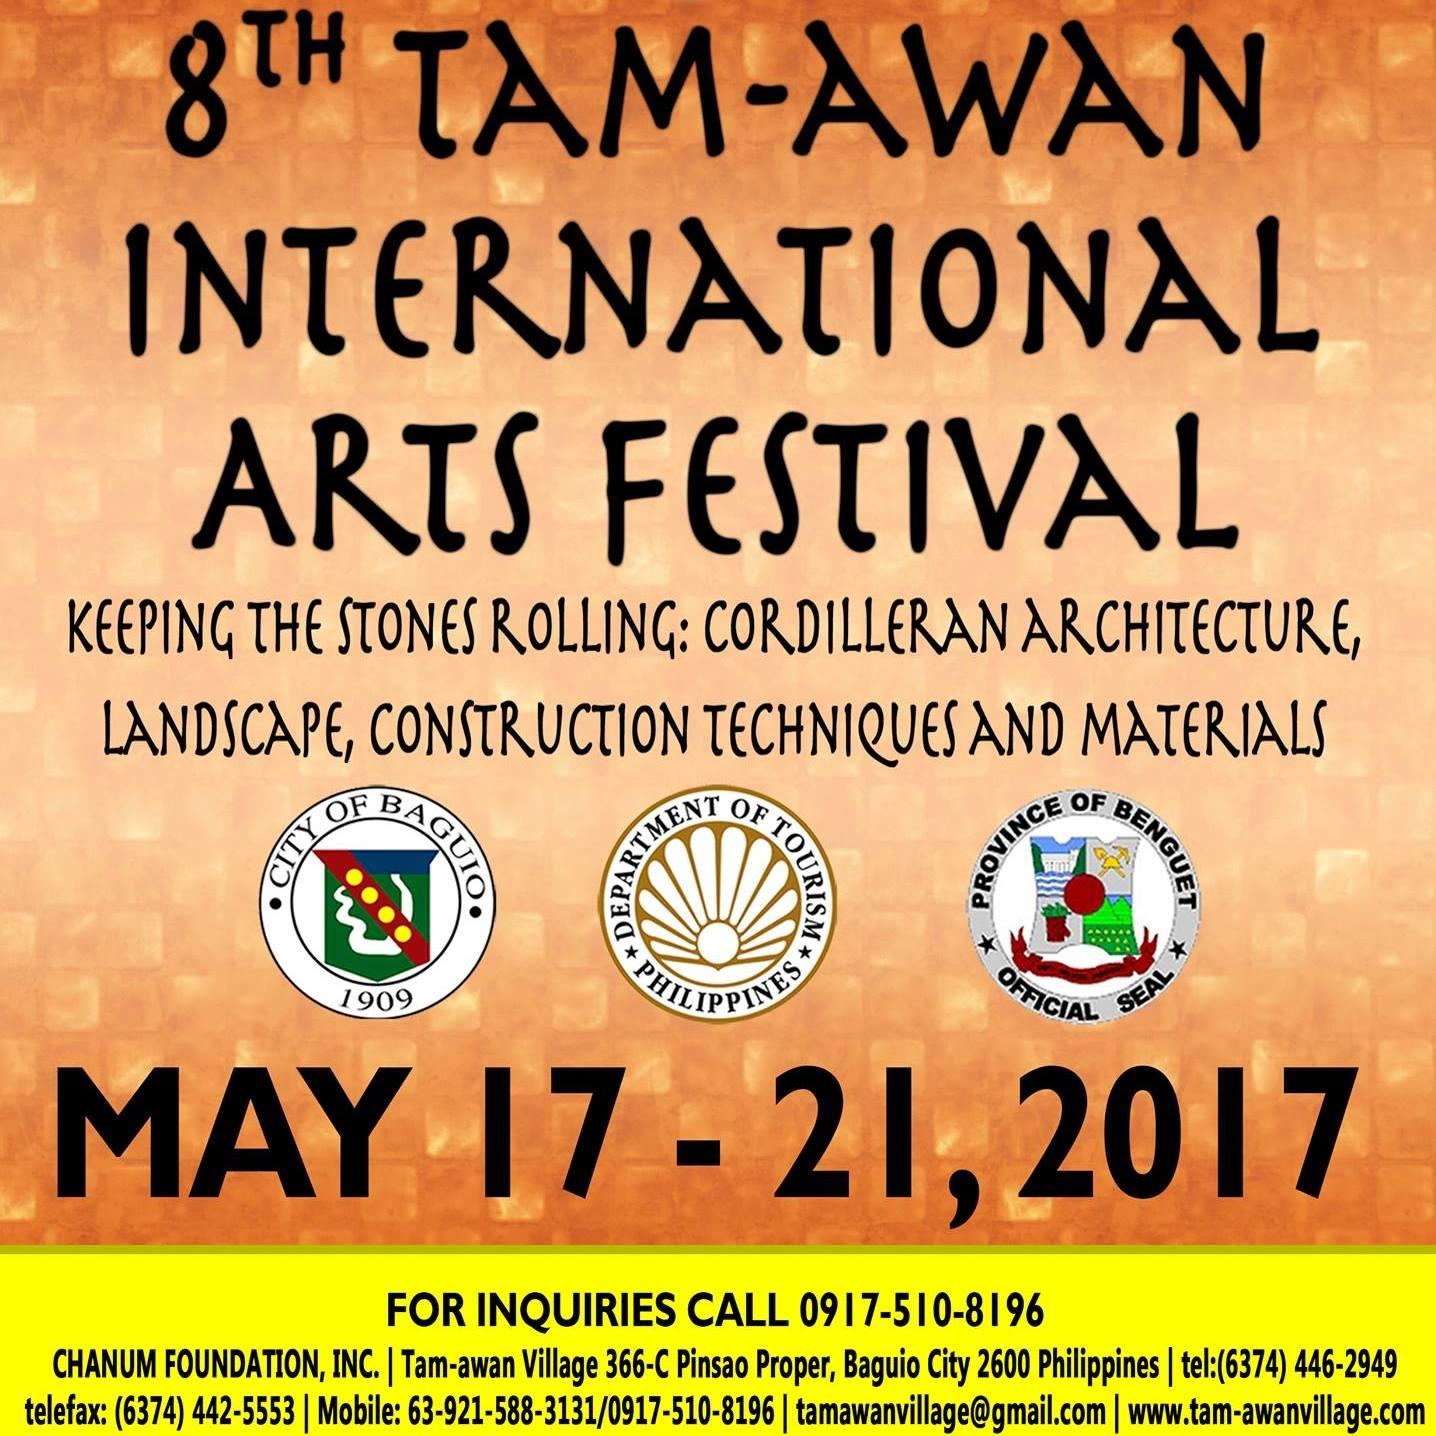 8th Tam-awan International Arts Festival Baguio City Cordillera Administrative Region Philippines